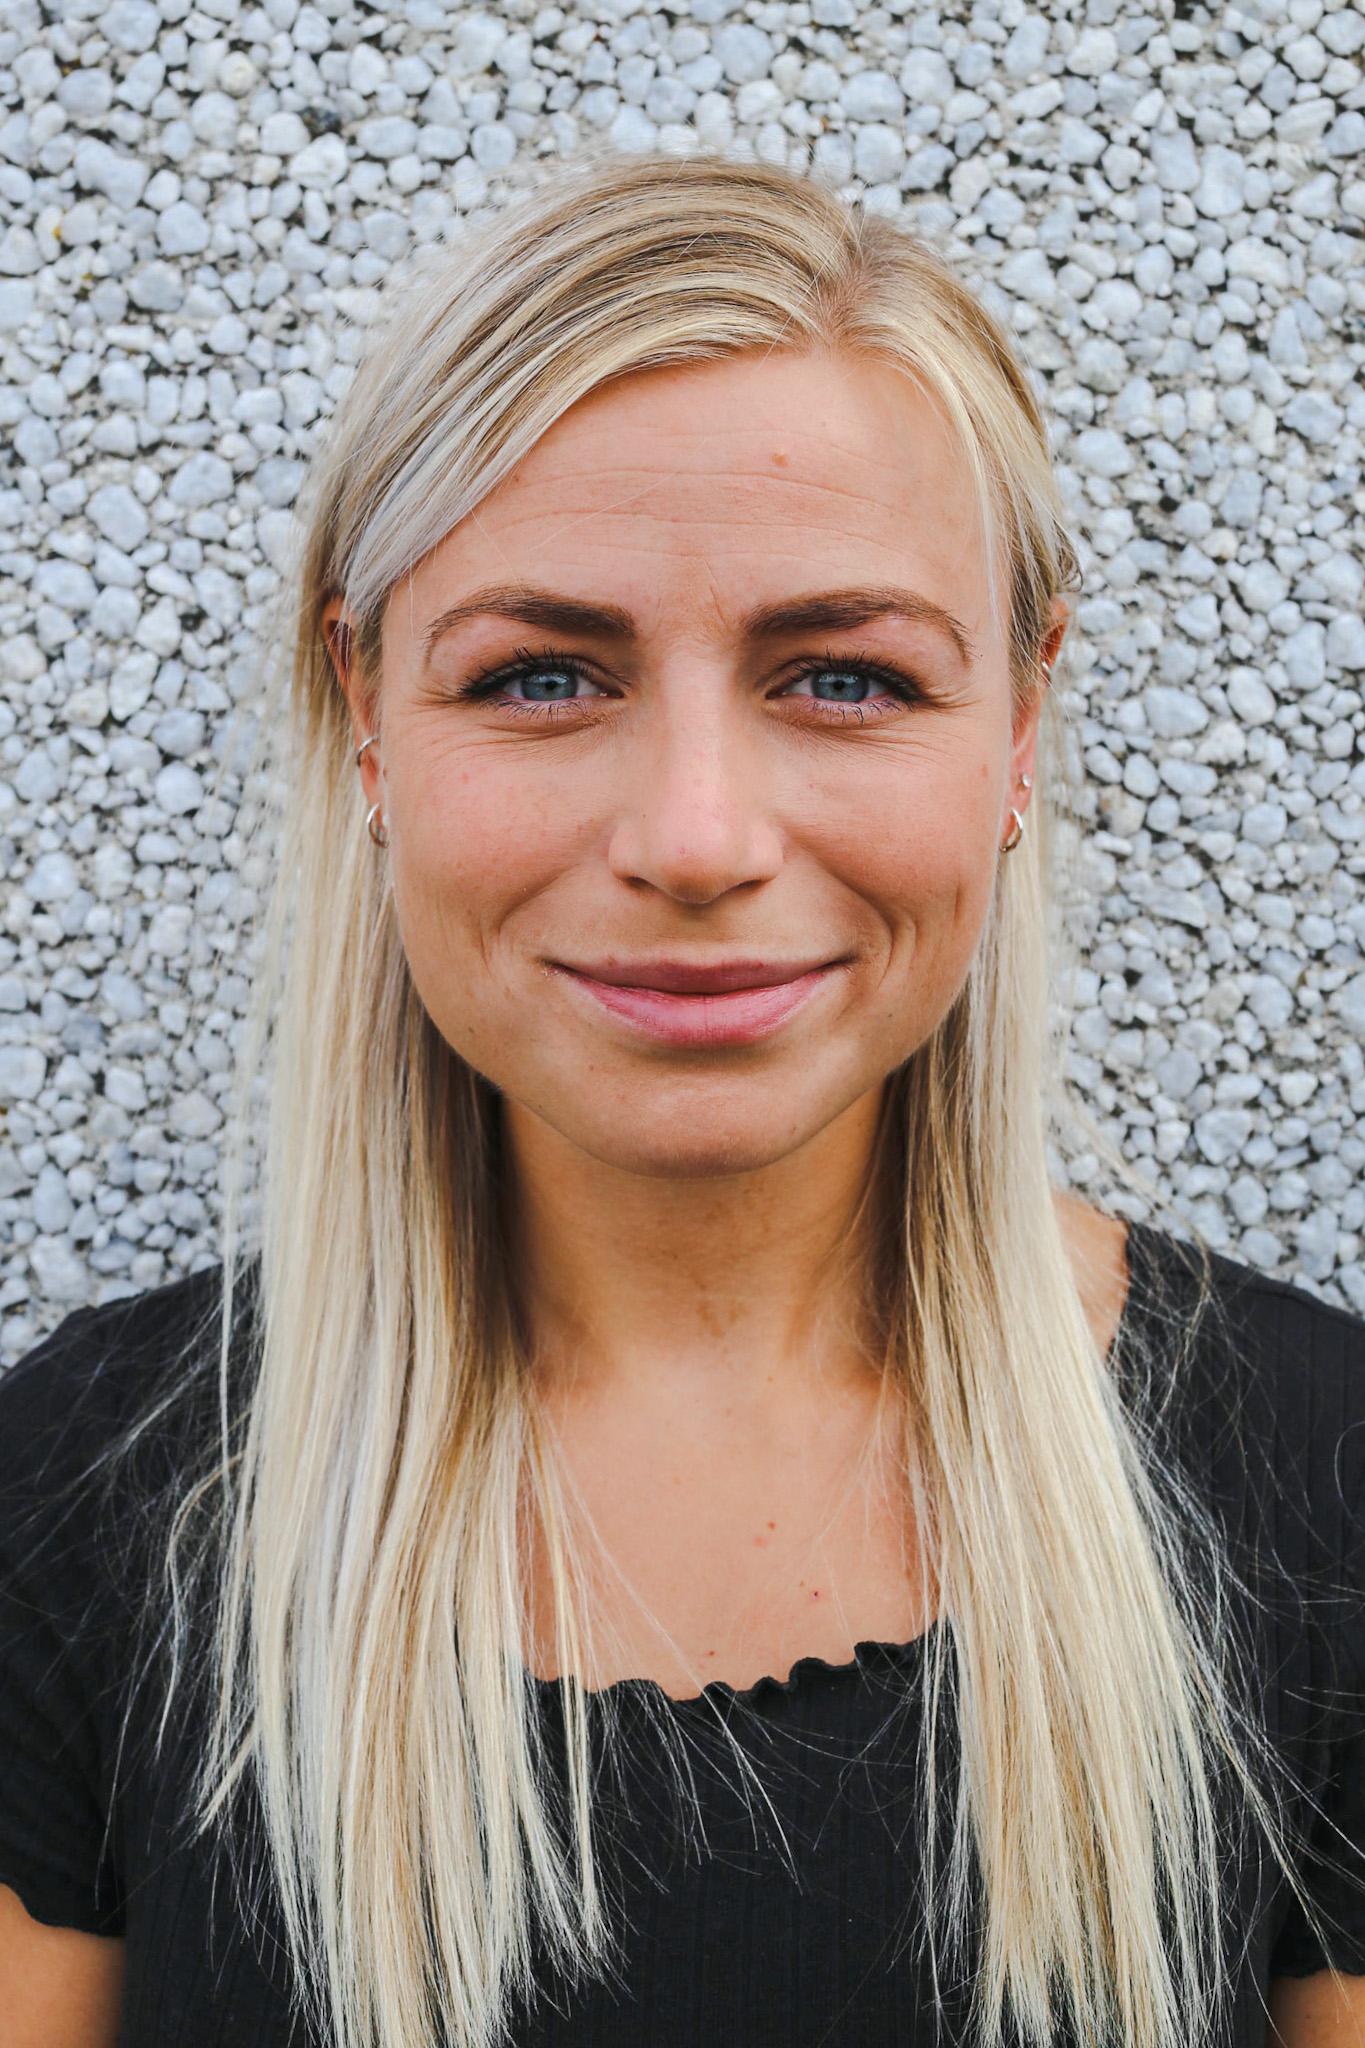 Mai Hjelmgaard